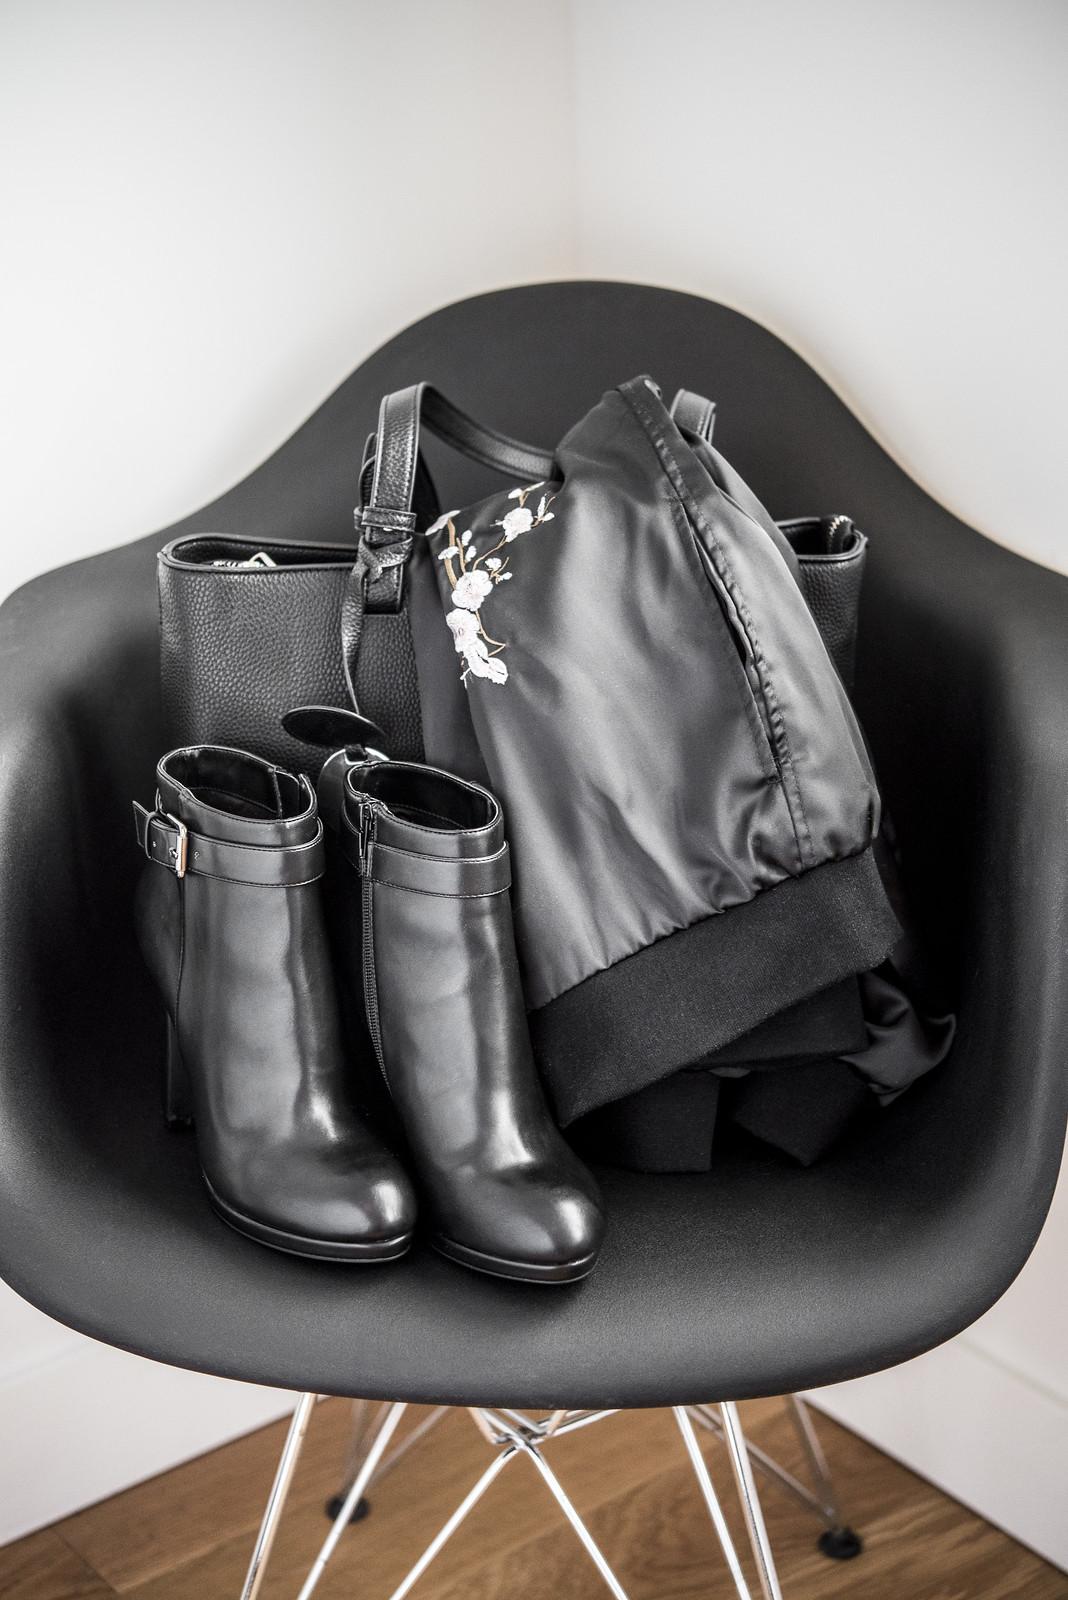 camdg, camille dg, lookbook, all black, noir, lechateau